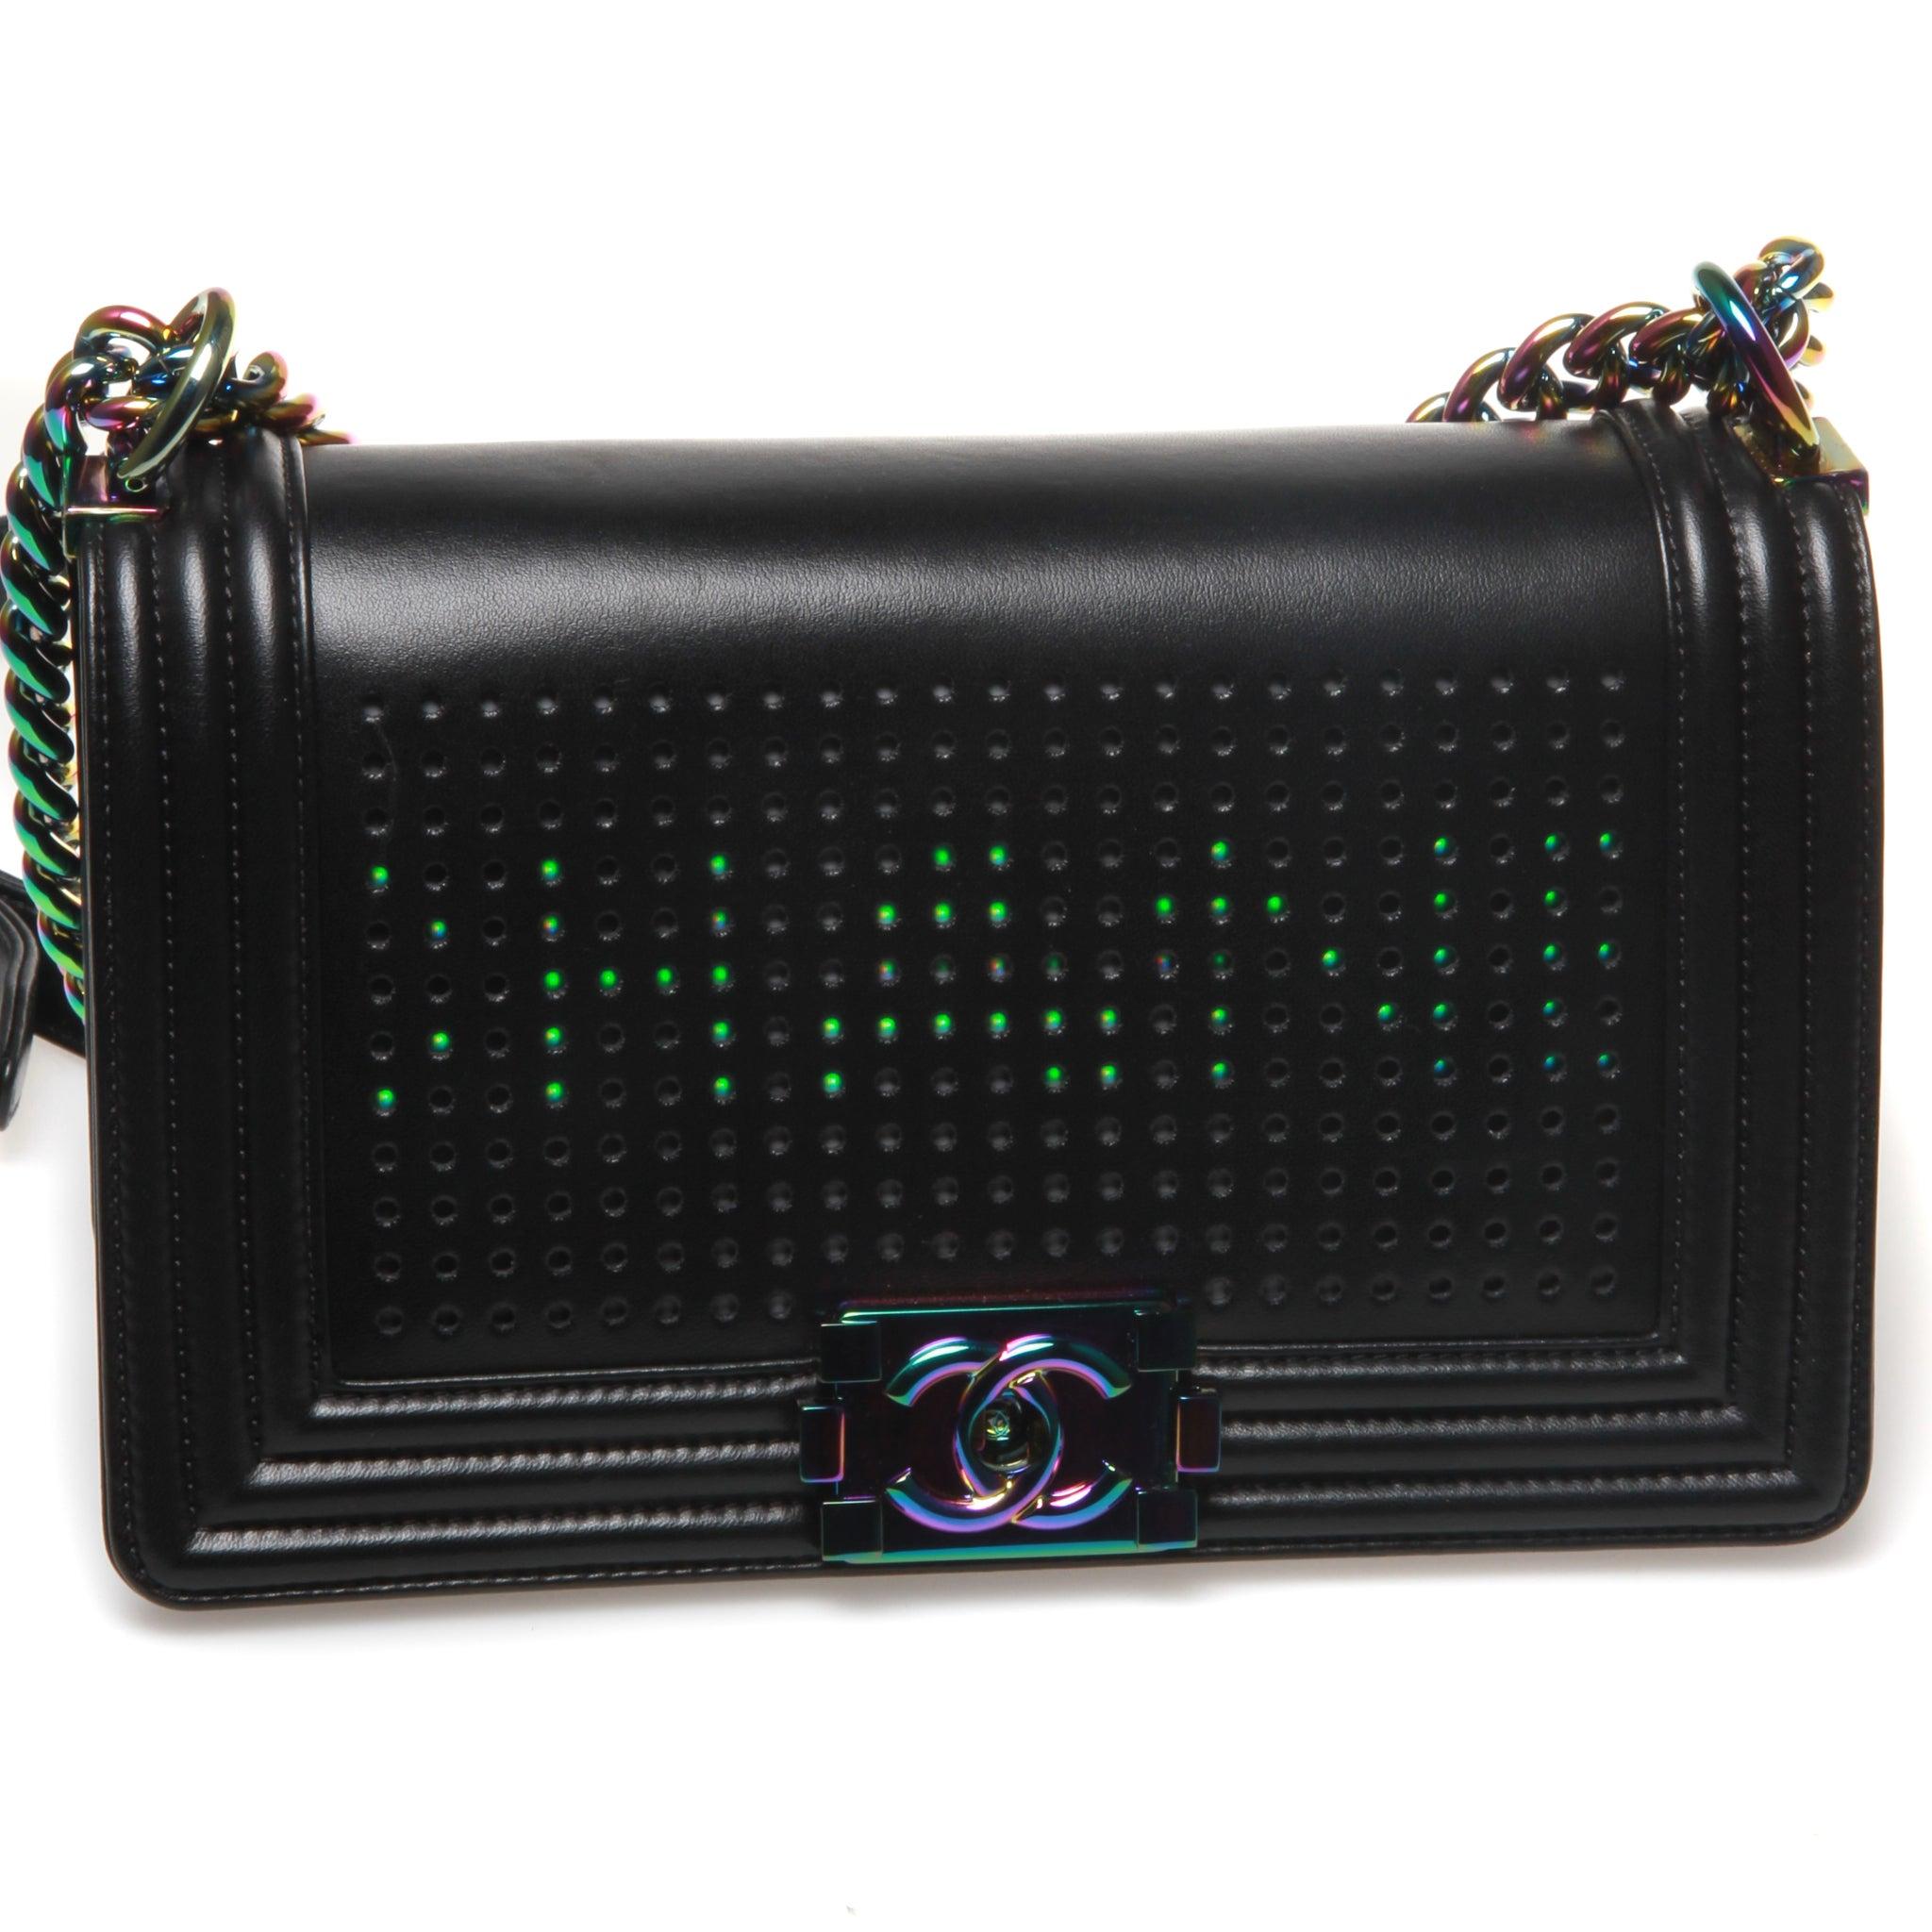 a8c84b90abb0 Chanel Led Old Medium Boy Chanel 2.0 Flap Bag For Sale at 1stdibs